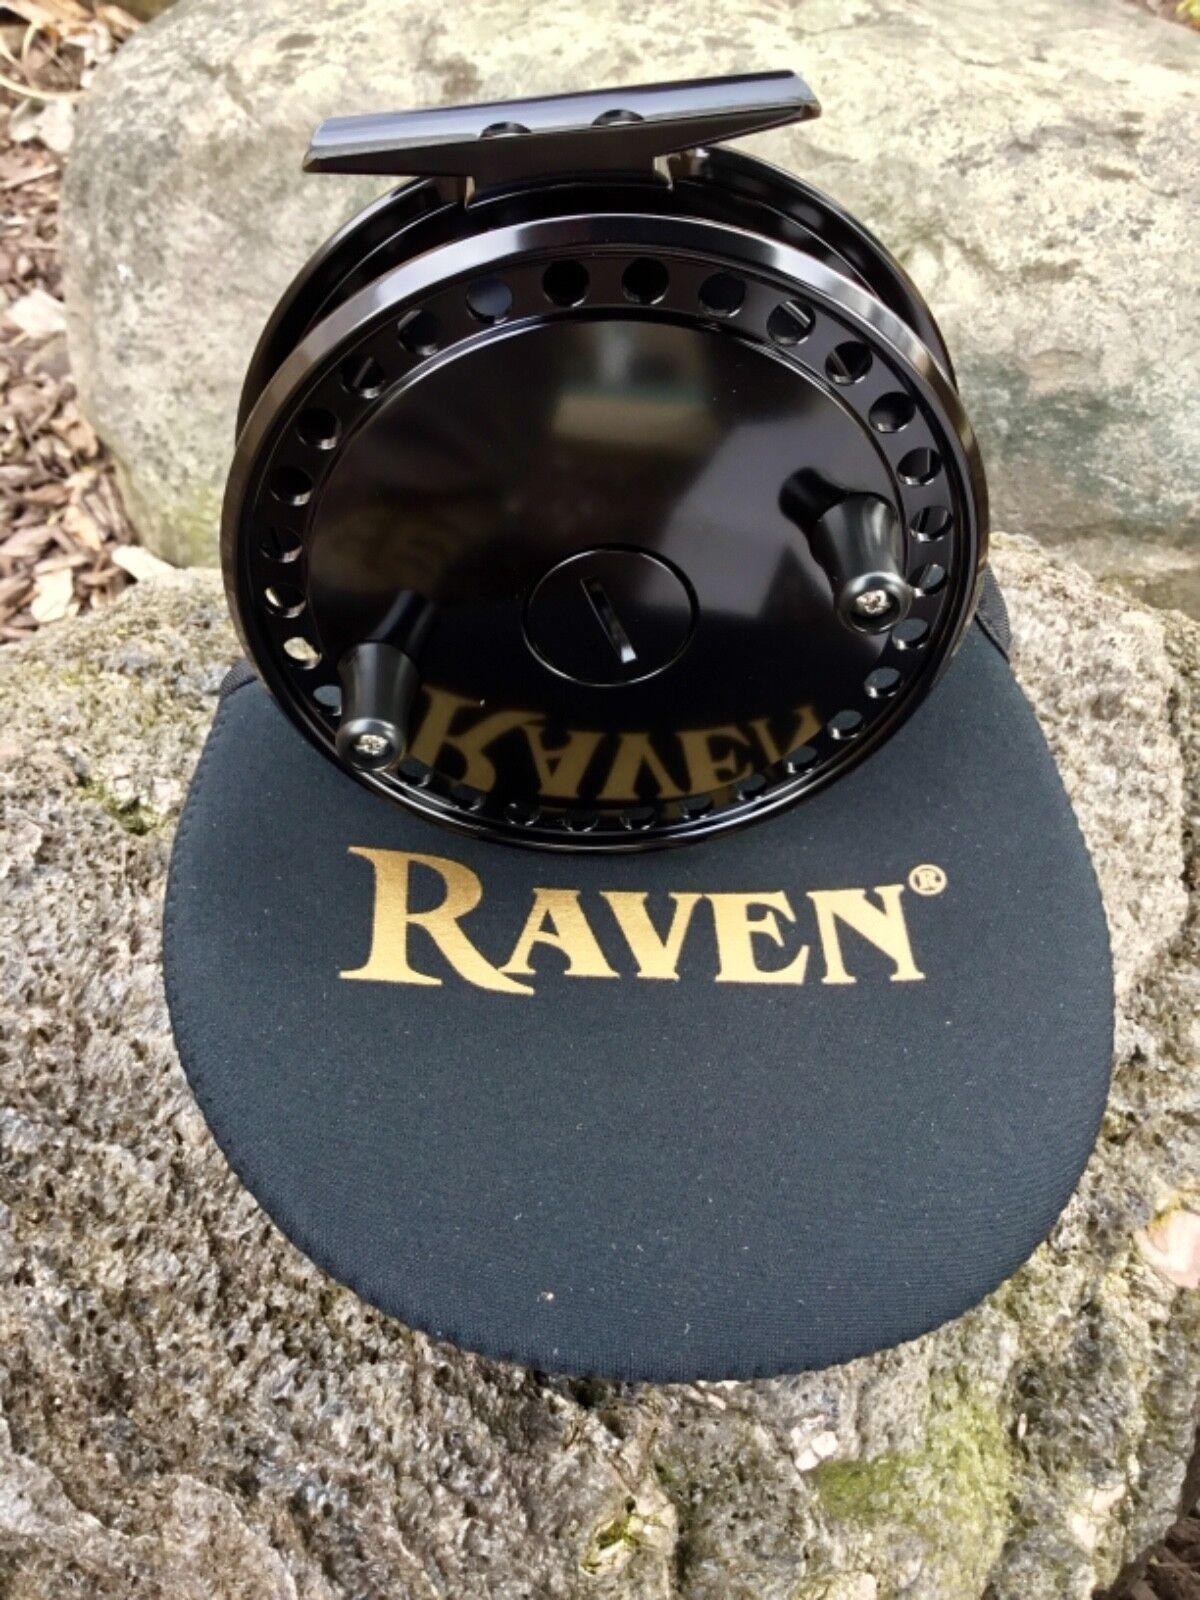 Raven matriz flotar Cocherete 4 3 8  negros, bolsa libre, Acabado Negro Nuevo Gran